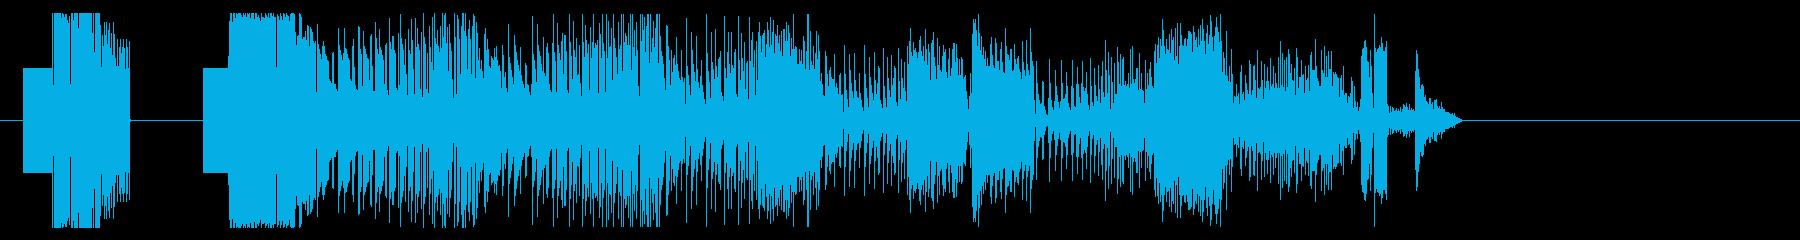 KANT8bit効果音08244の再生済みの波形